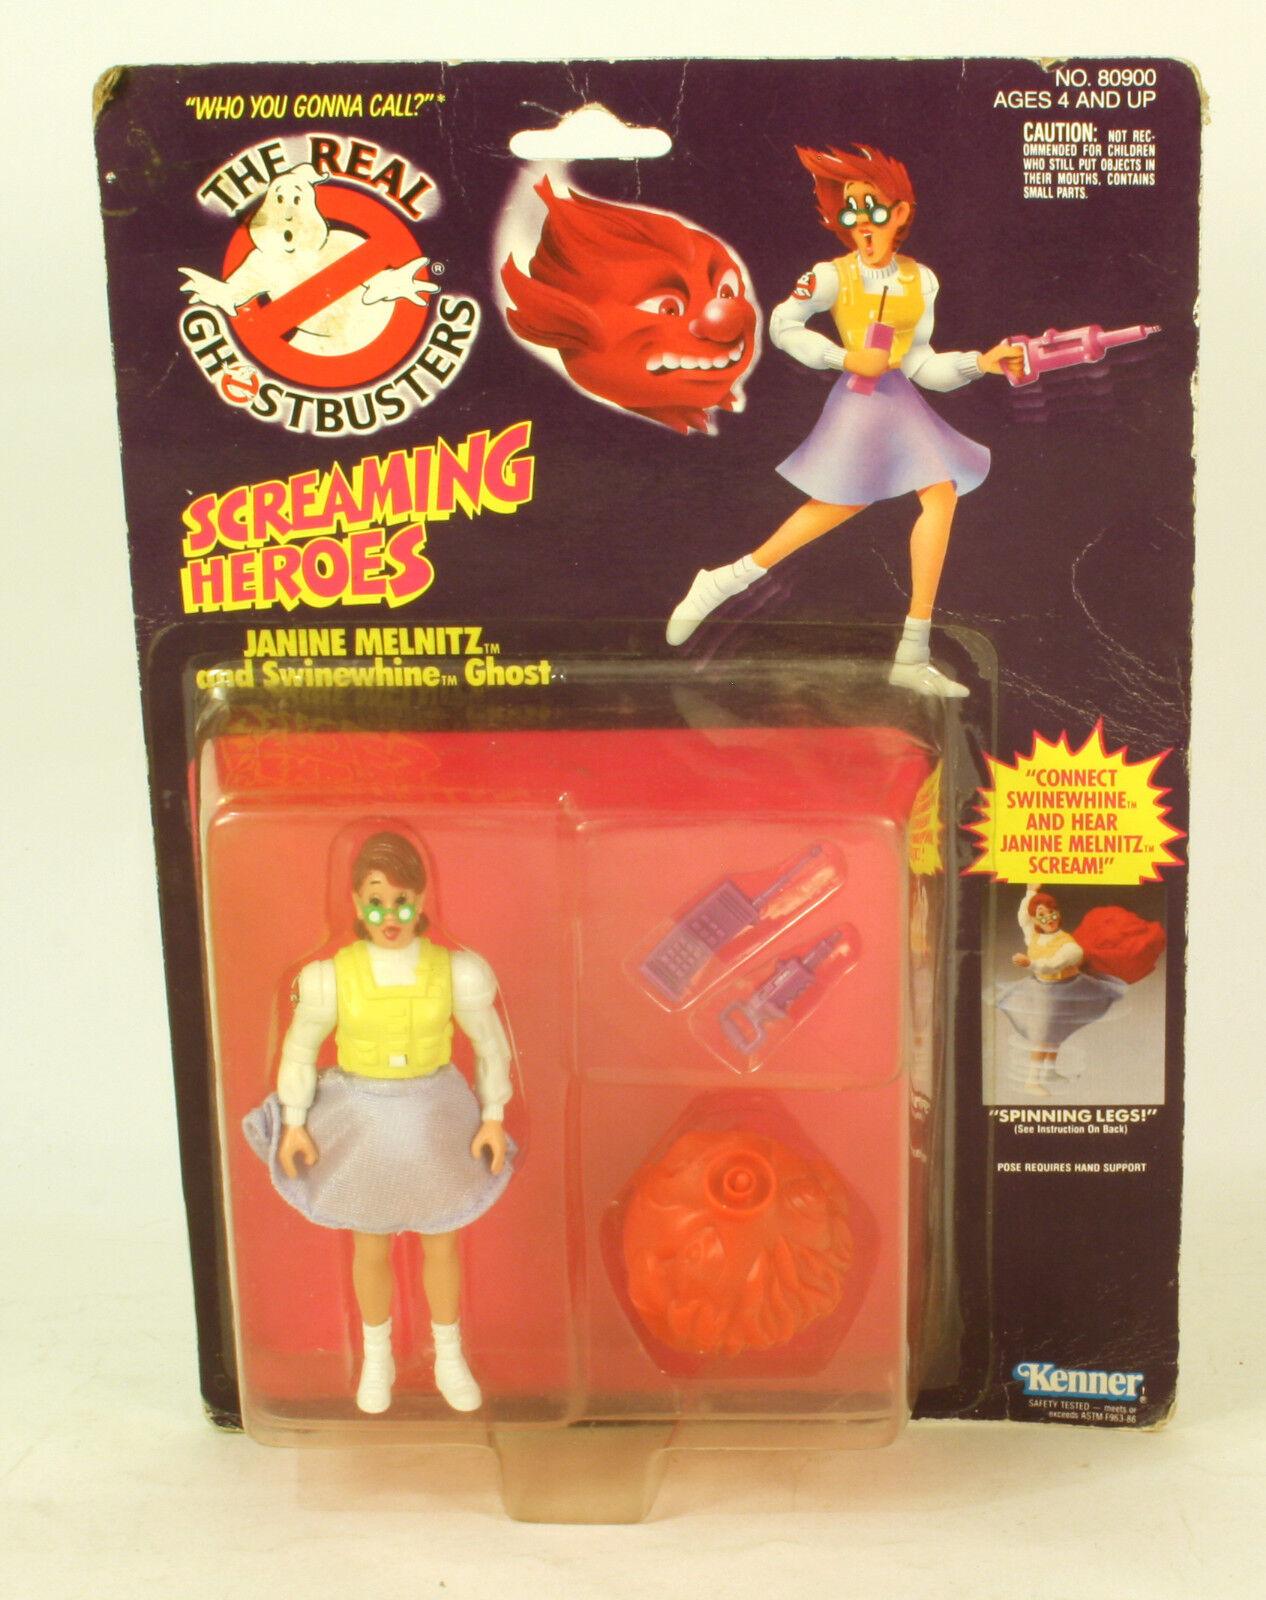 The real ghostbusters sceaming helden janine melnitz moc 1984 kenner